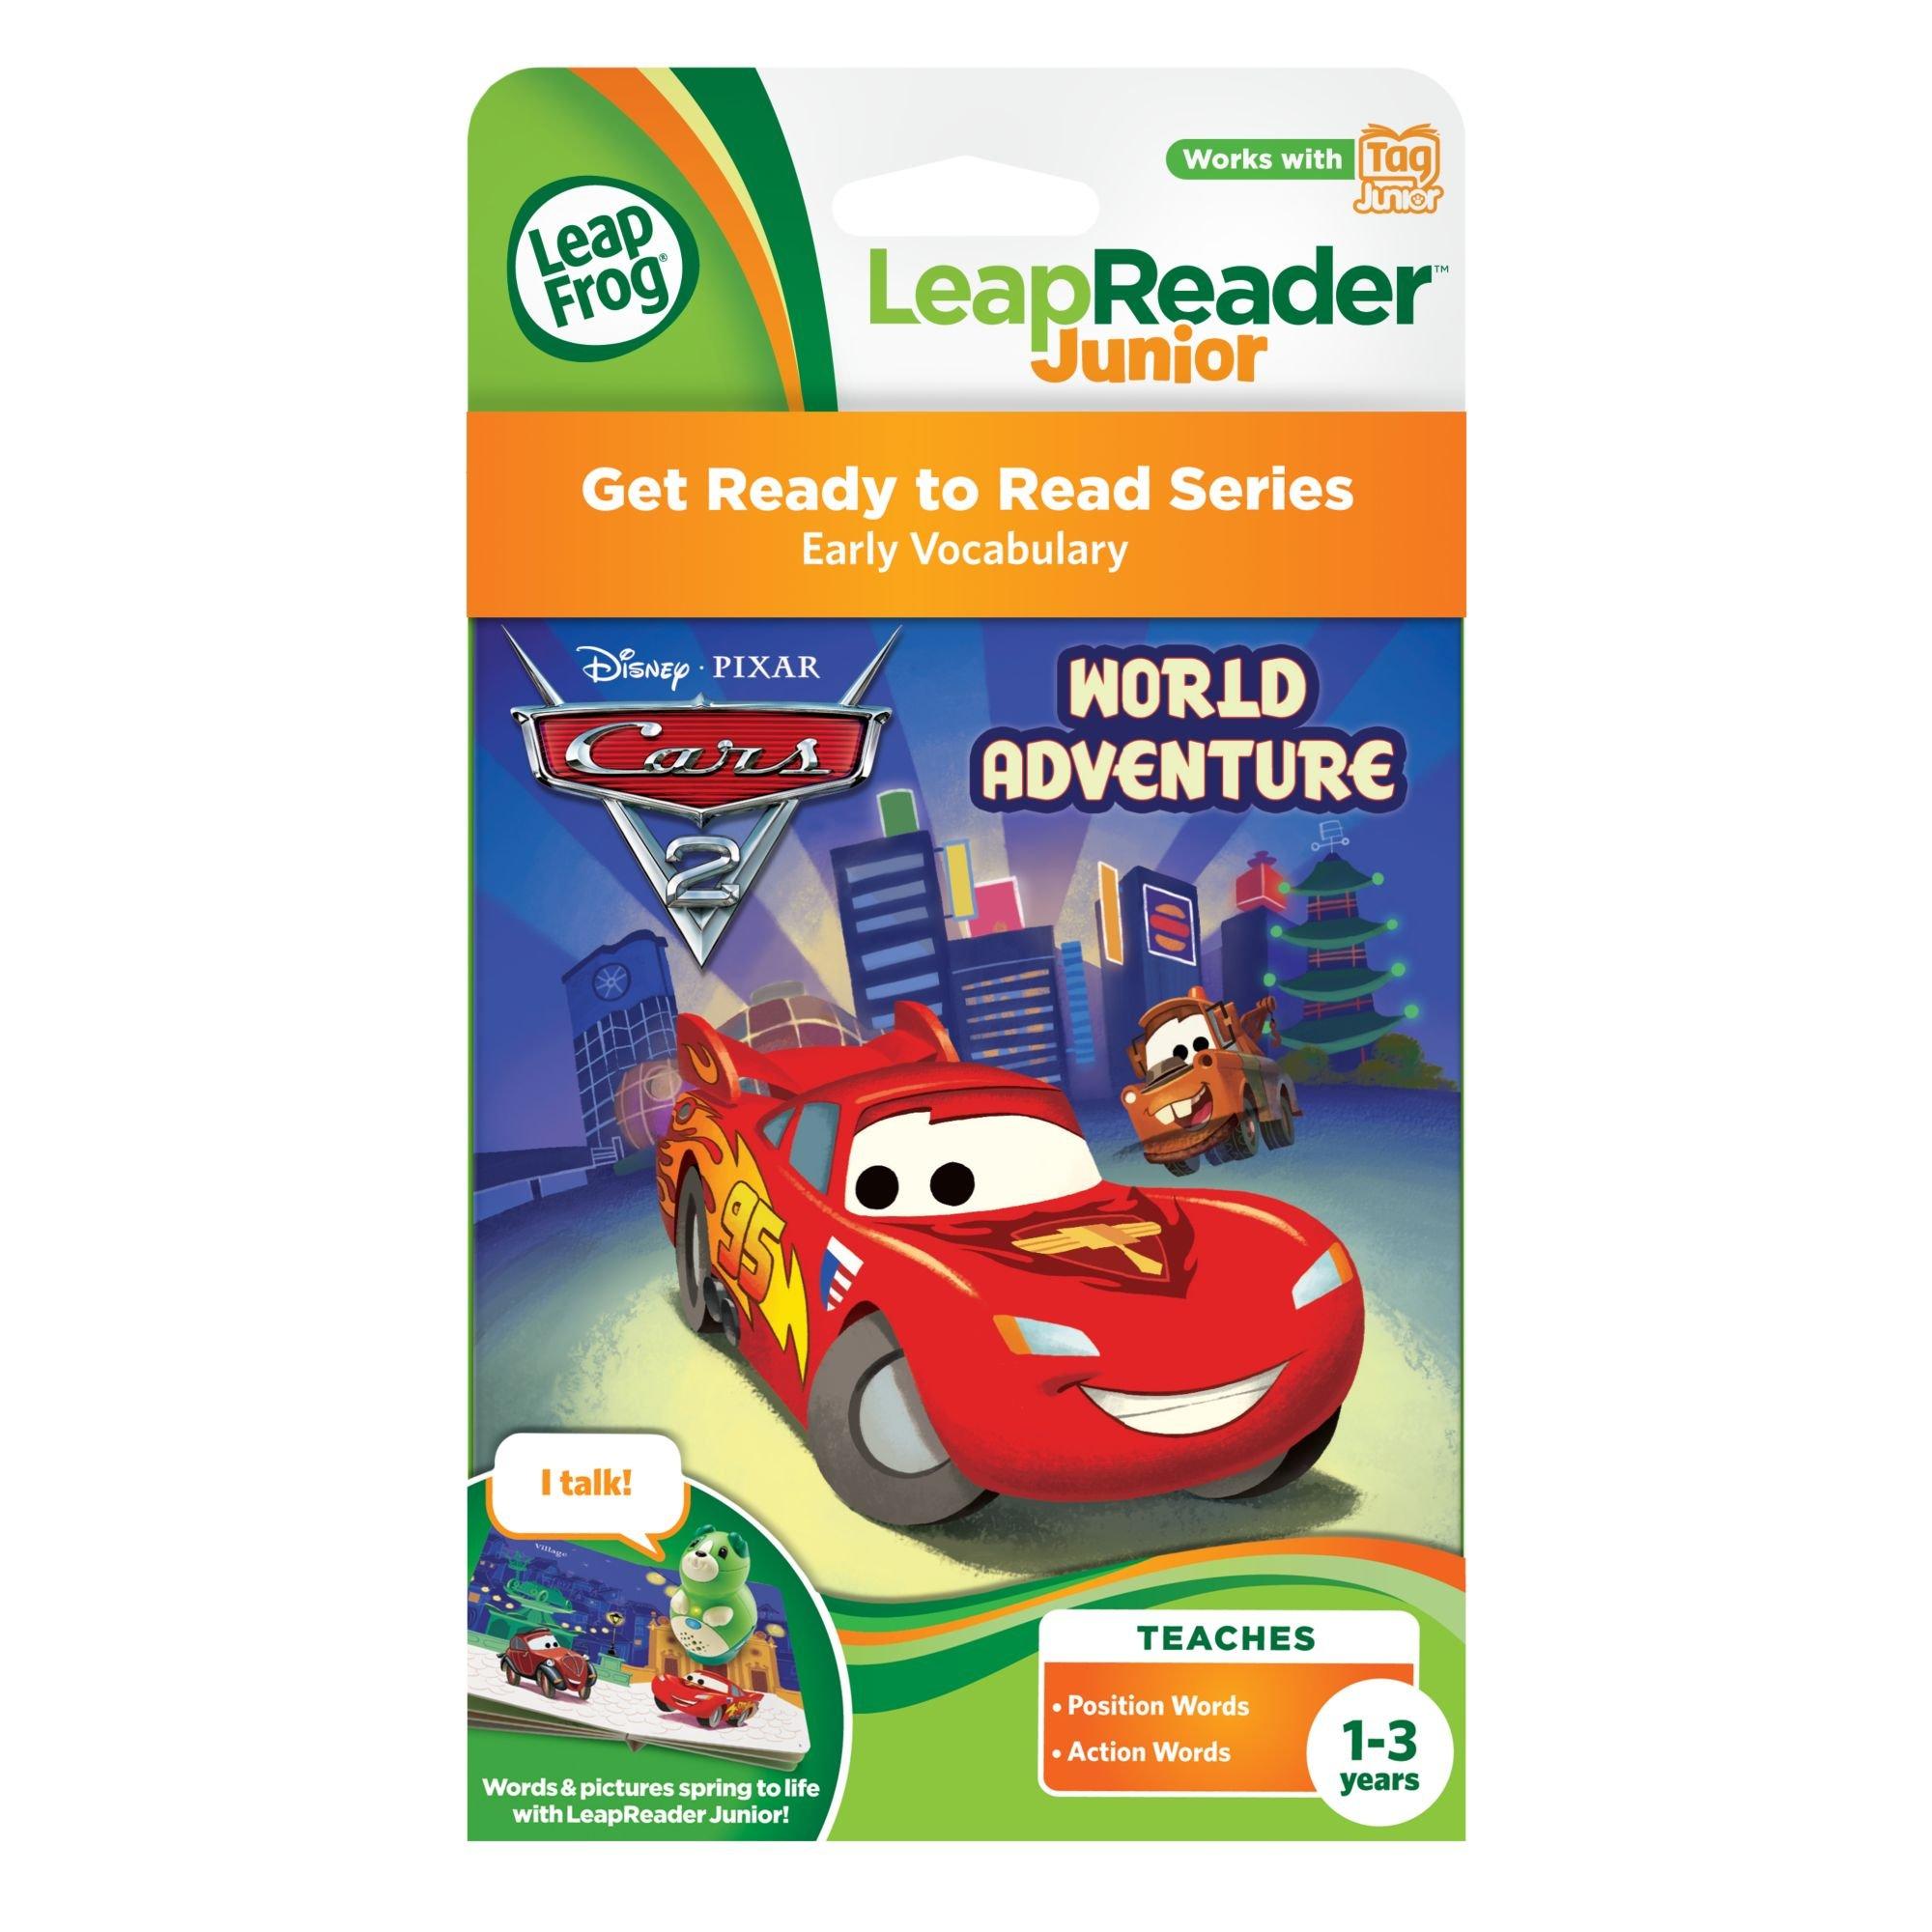 Leapfrog LeapReader Junior Book: DisneyPixar Cars 2: World Adventure (works with Tag Junior) by LeapFrog (Image #3)